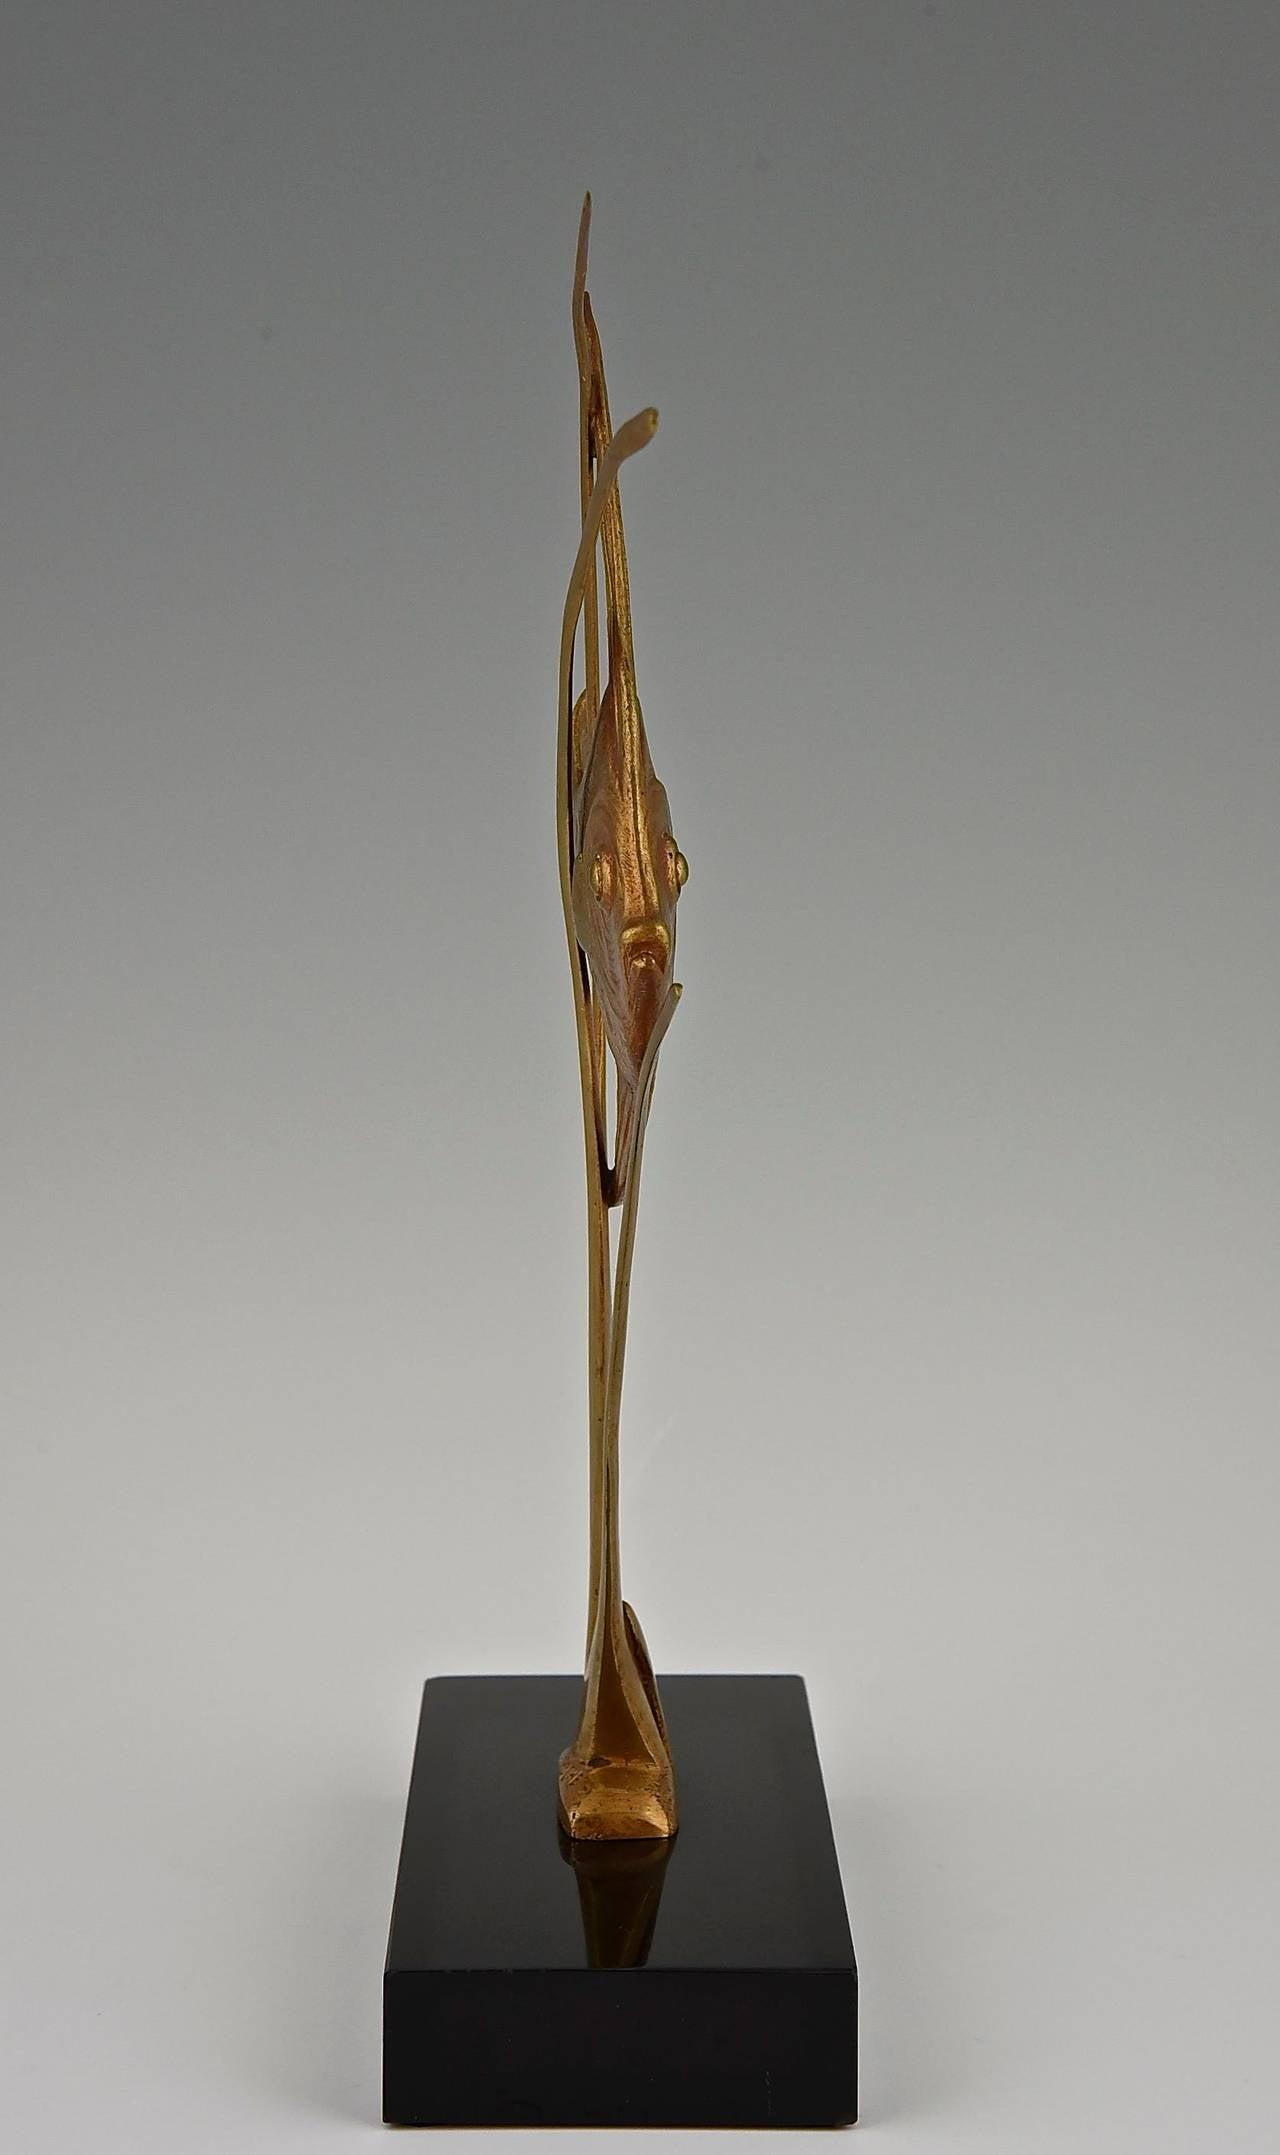 20th Century Art Deco Bronze Sculpture of a Fish by De Roche 1930 France For Sale